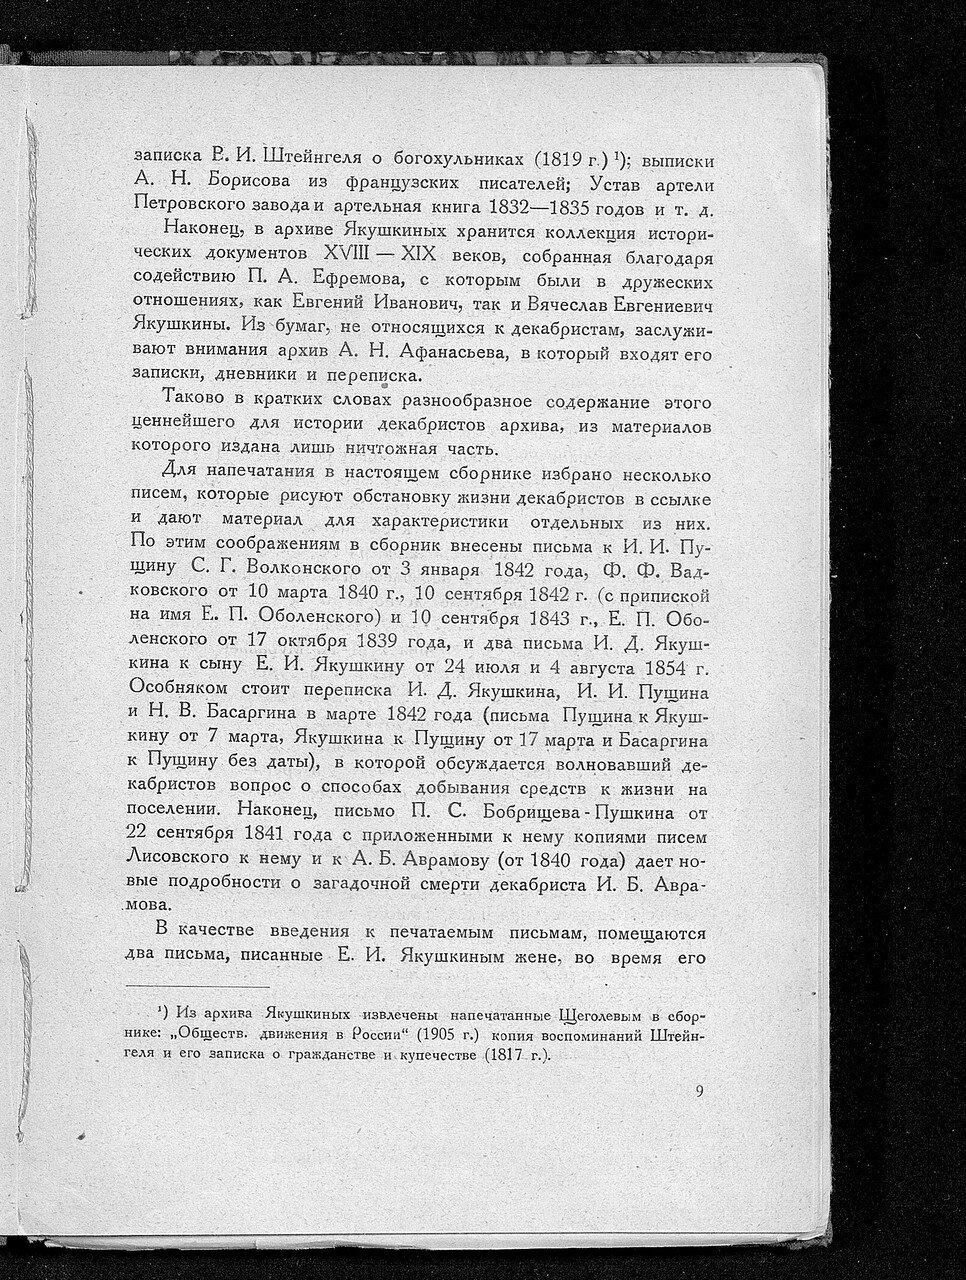 https://img-fotki.yandex.ru/get/877700/199368979.a0/0_214307_e8711e00_XXXL.jpg